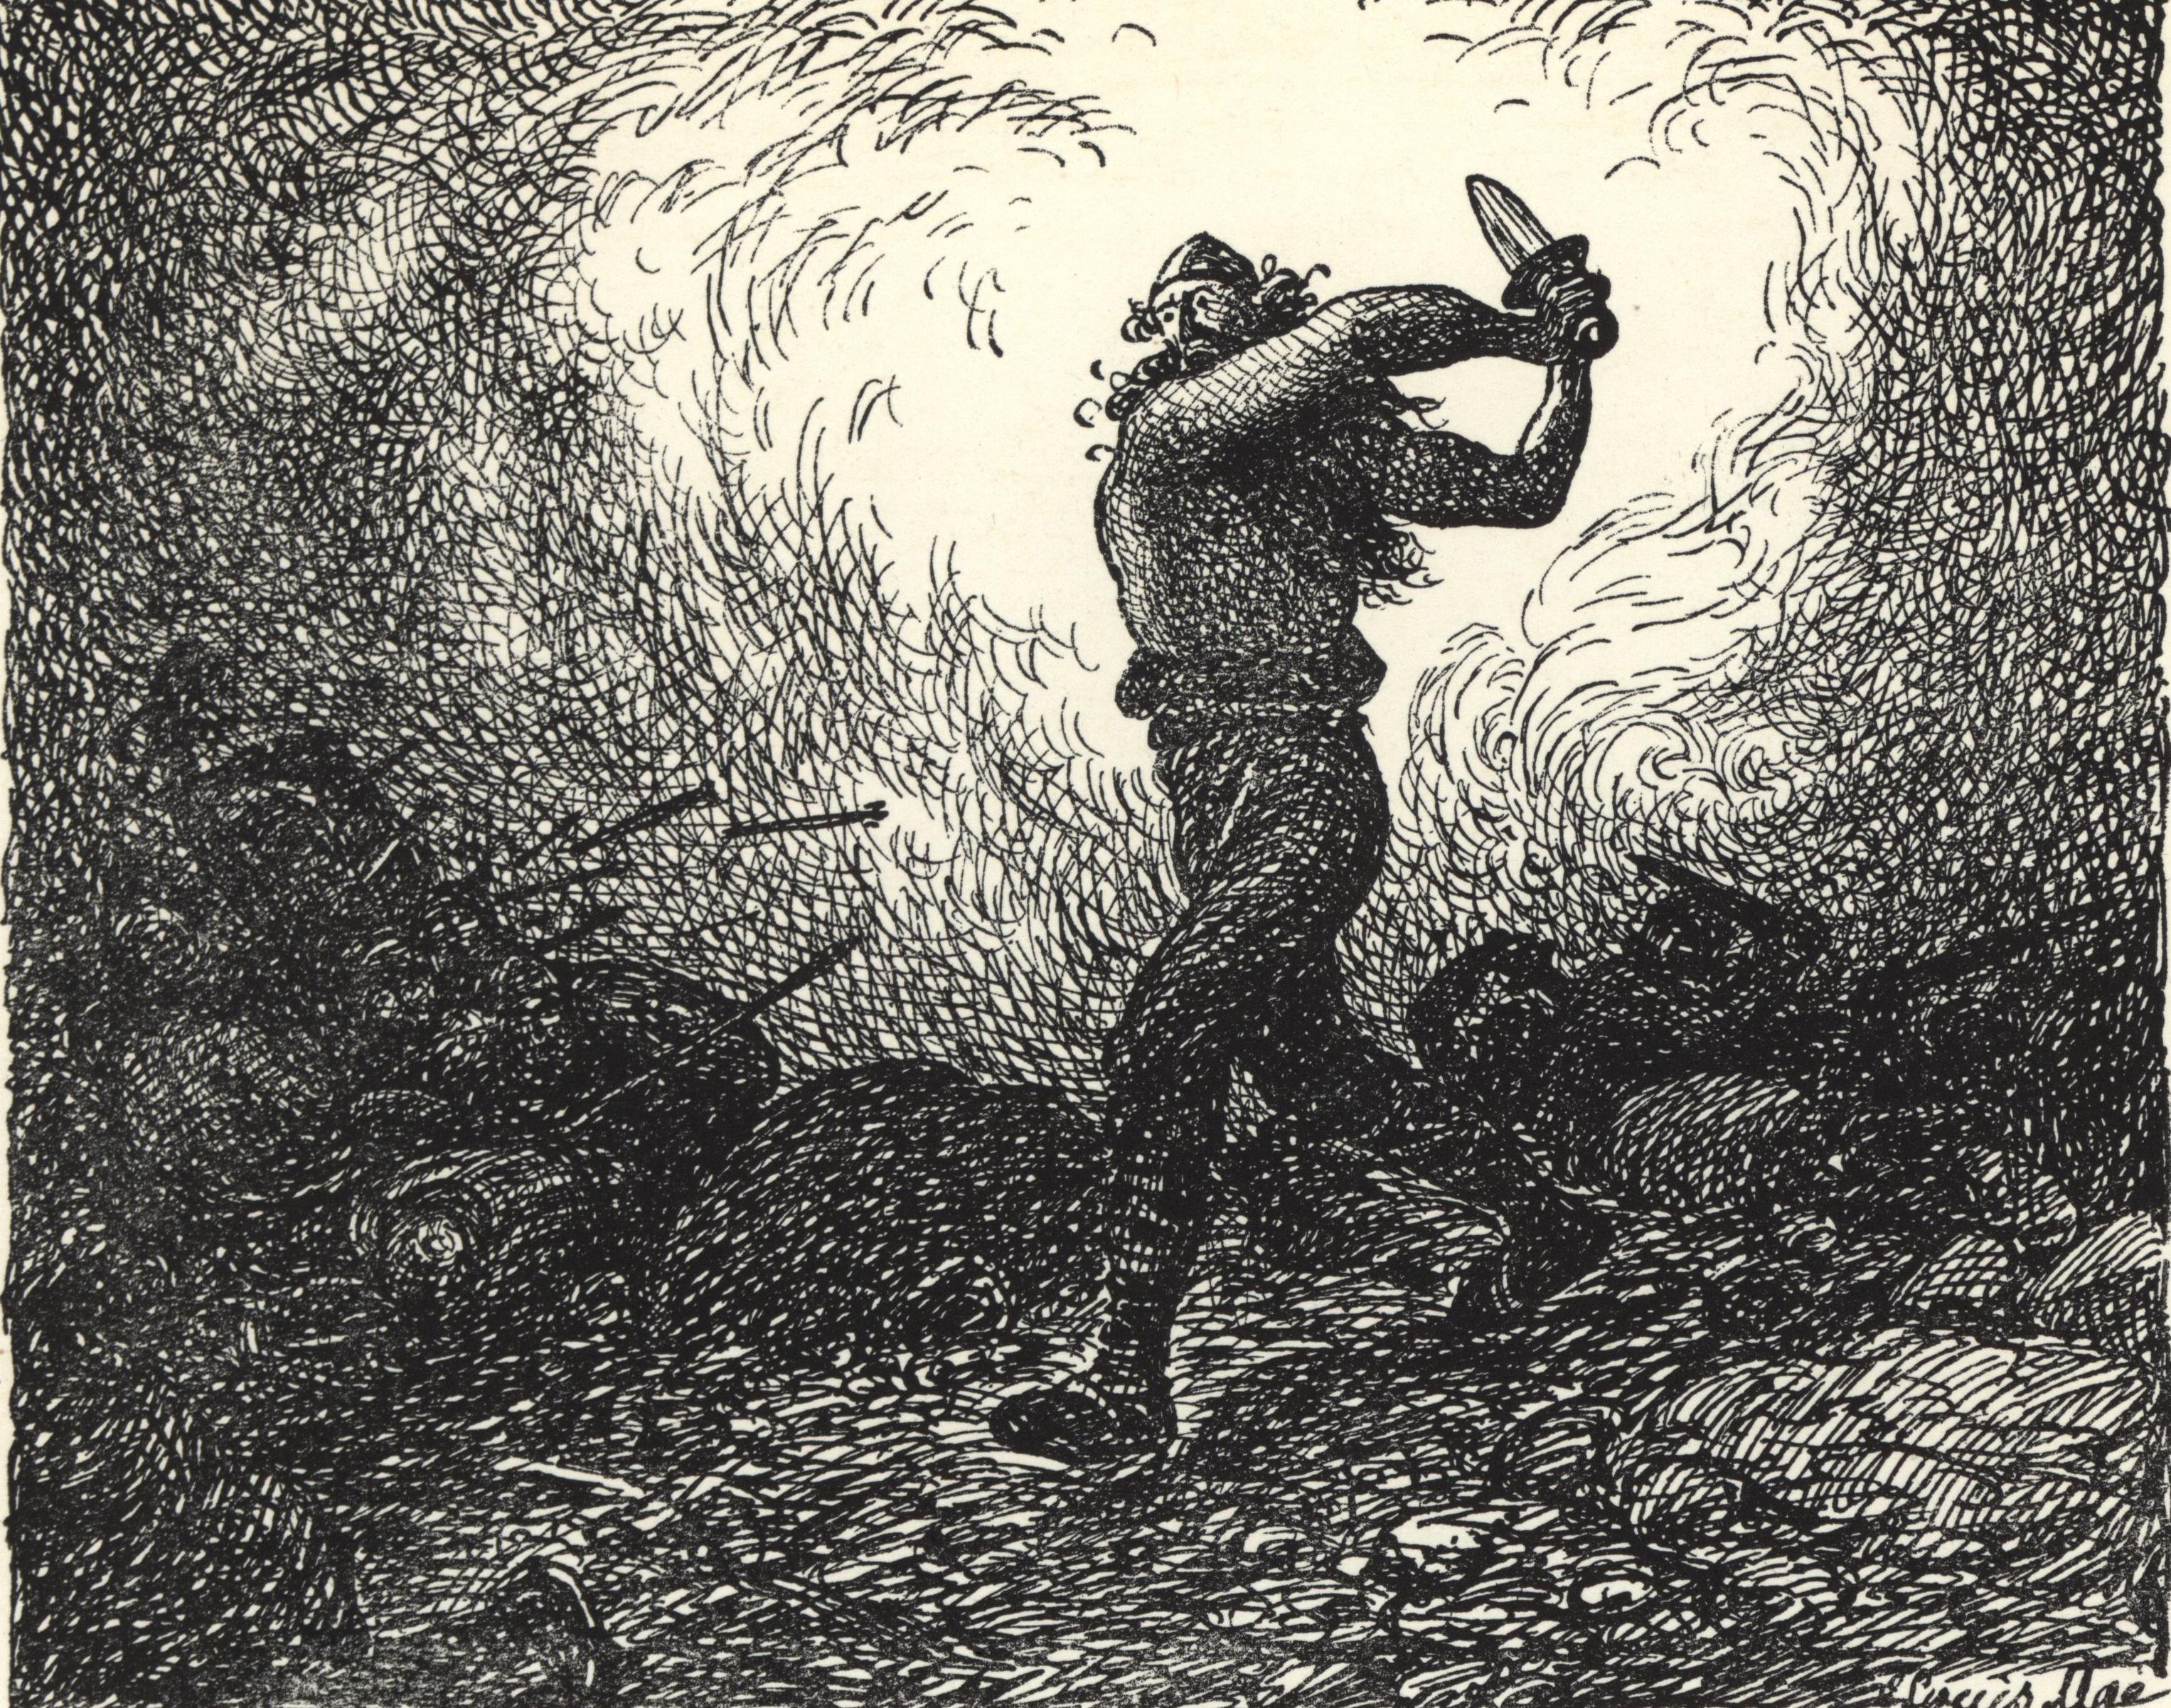 Starkaðr Fighting at the Battle of                                Brávellir